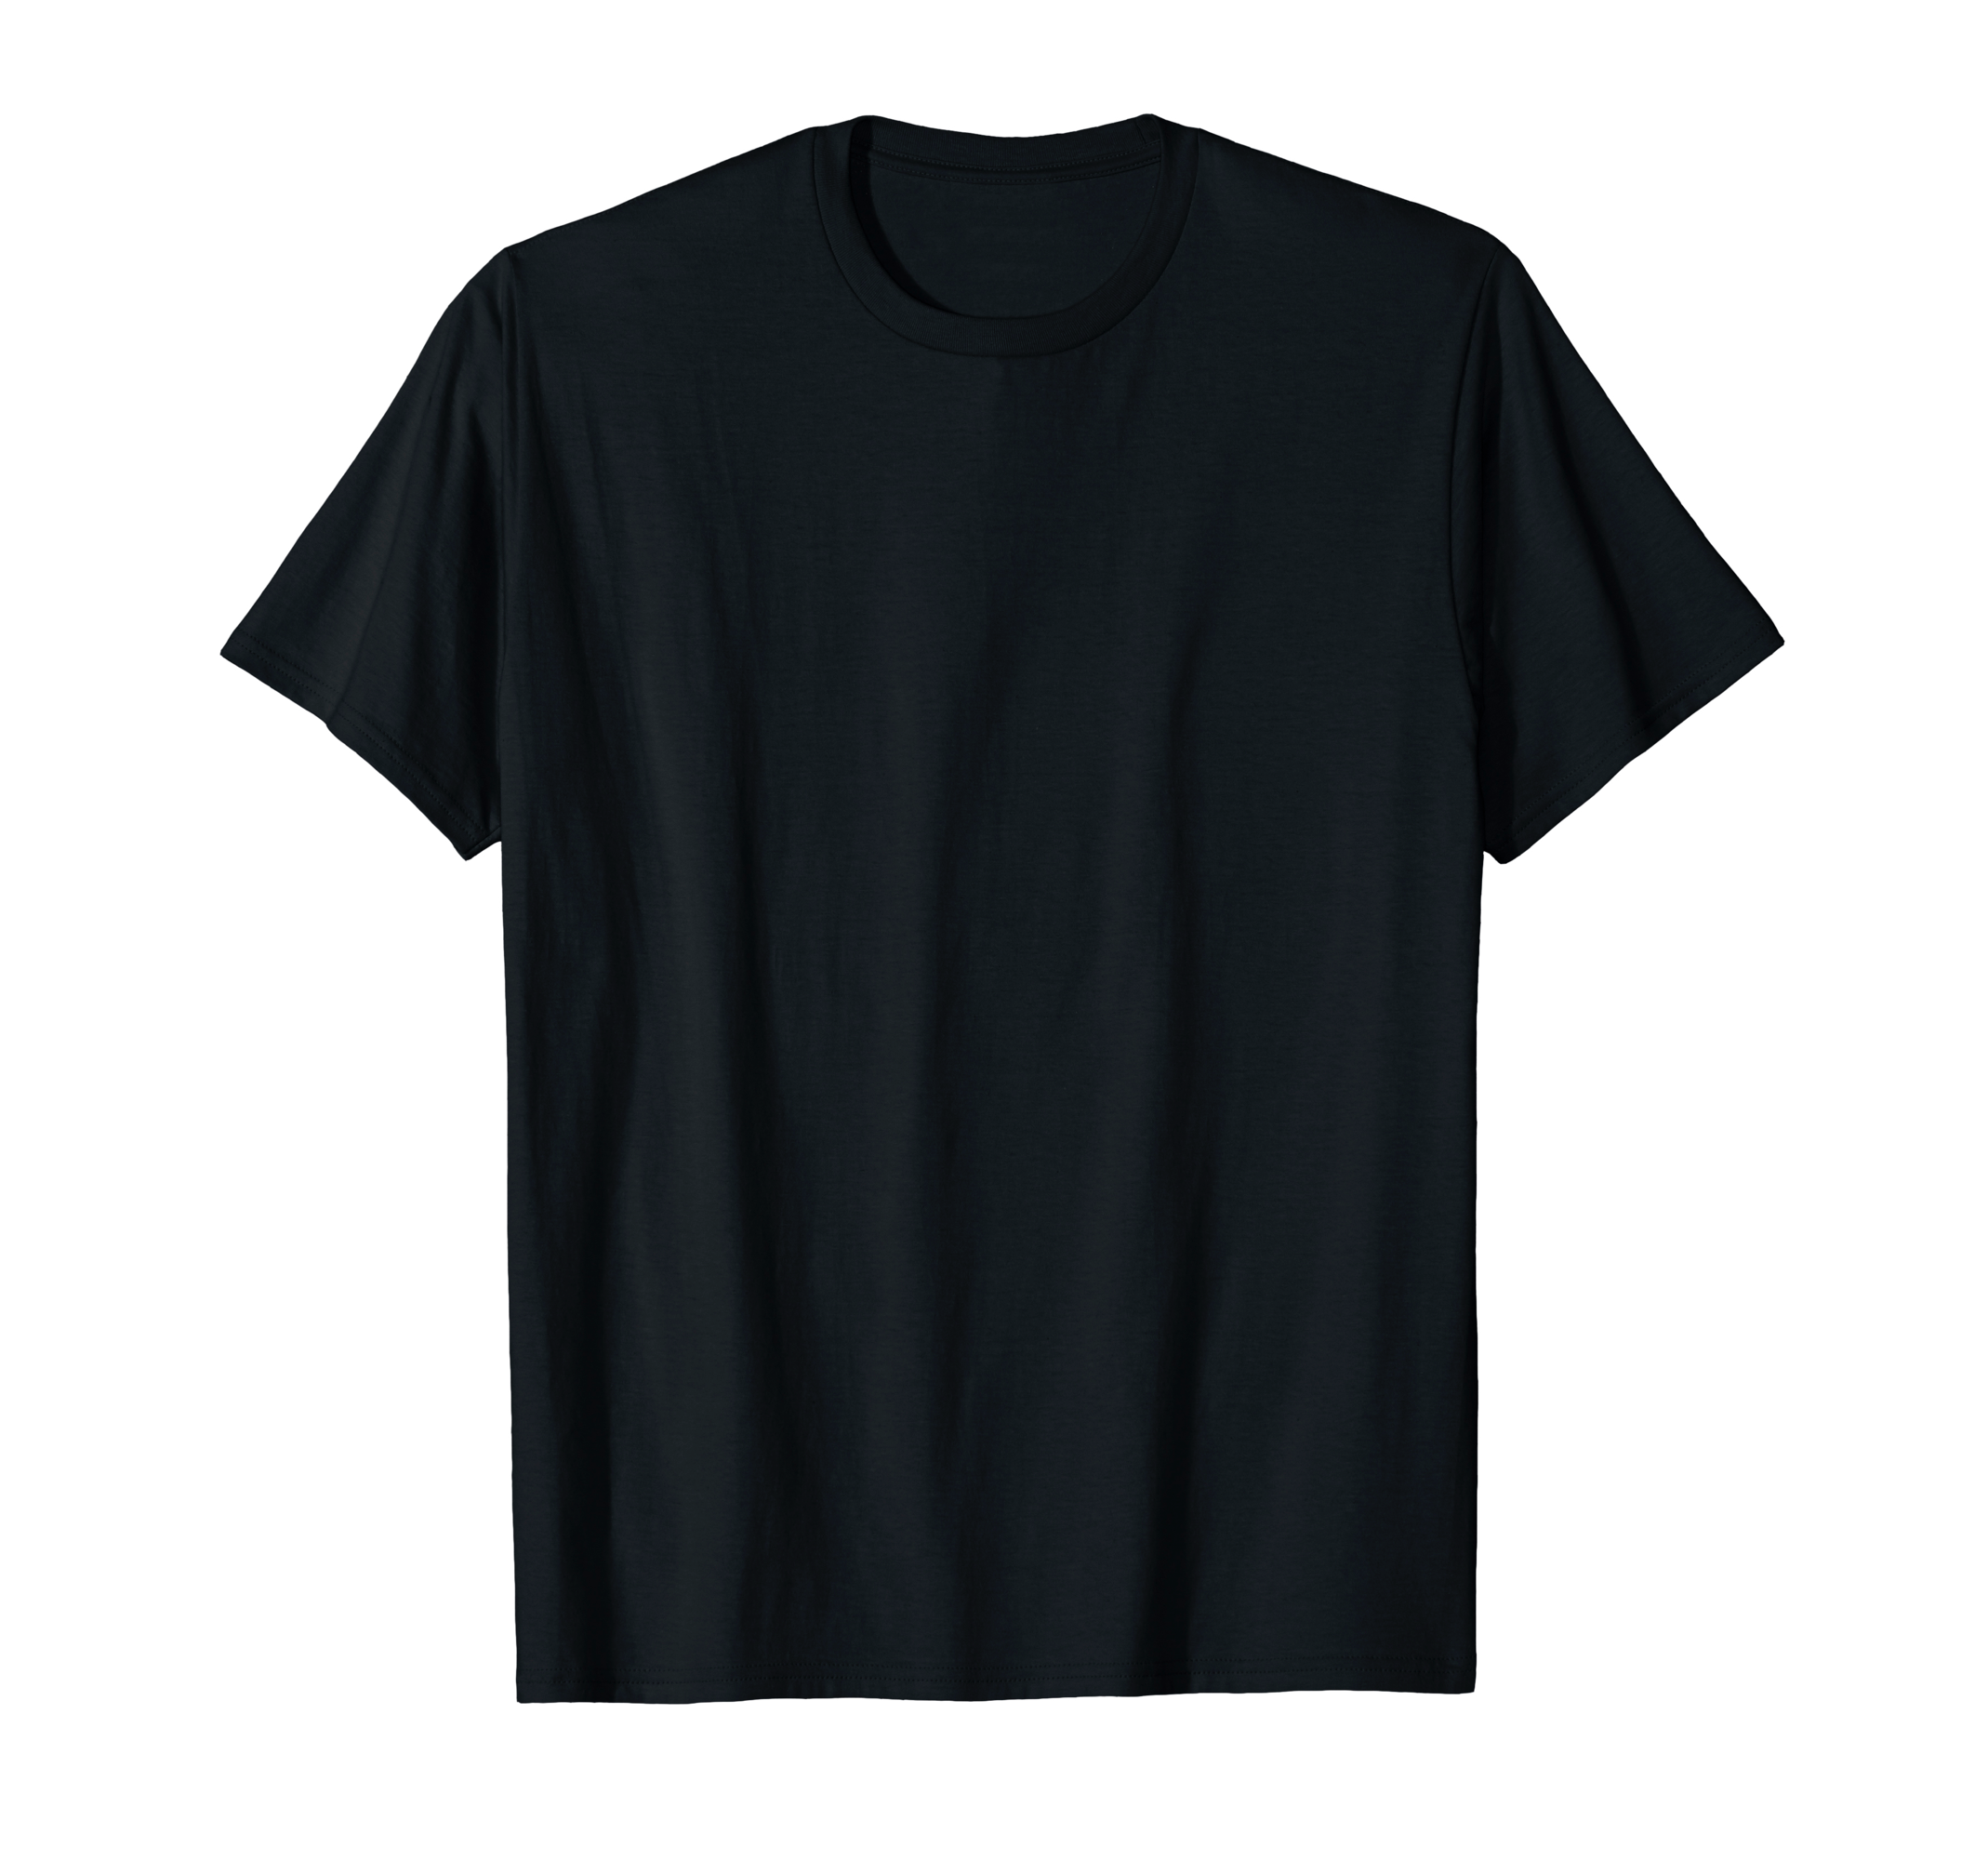 Trendy Dogs Clothes M Small /& Medium Dogs Apparel AngelDoggy.INC Dog T-Shirt